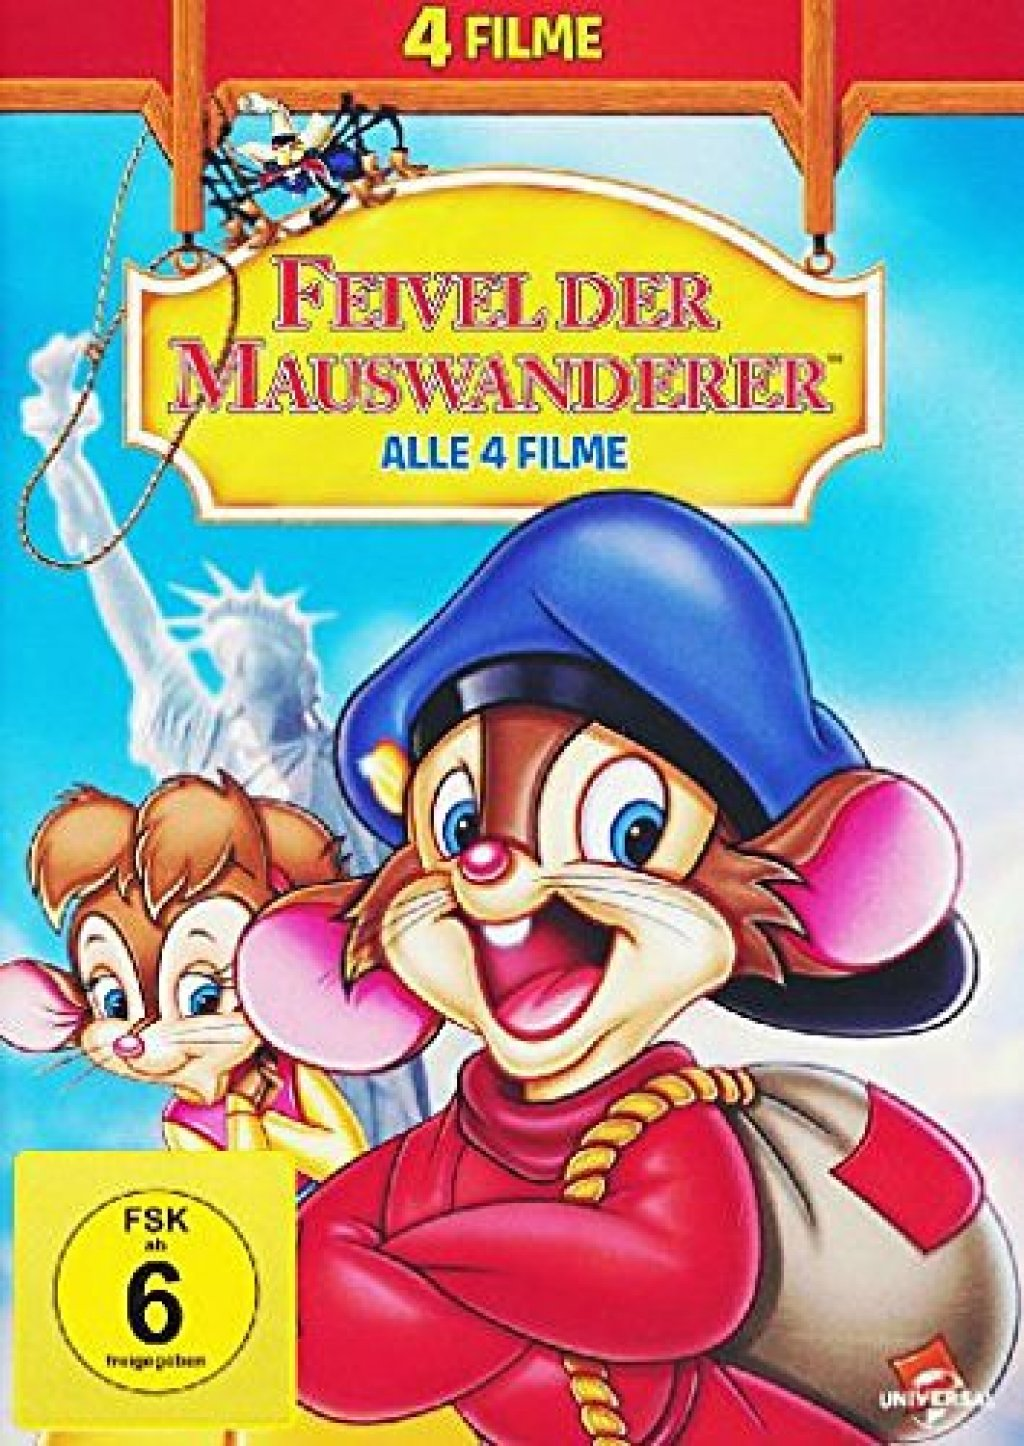 Feivel der Mauswanderer - Alle 4 Filme (DVD)